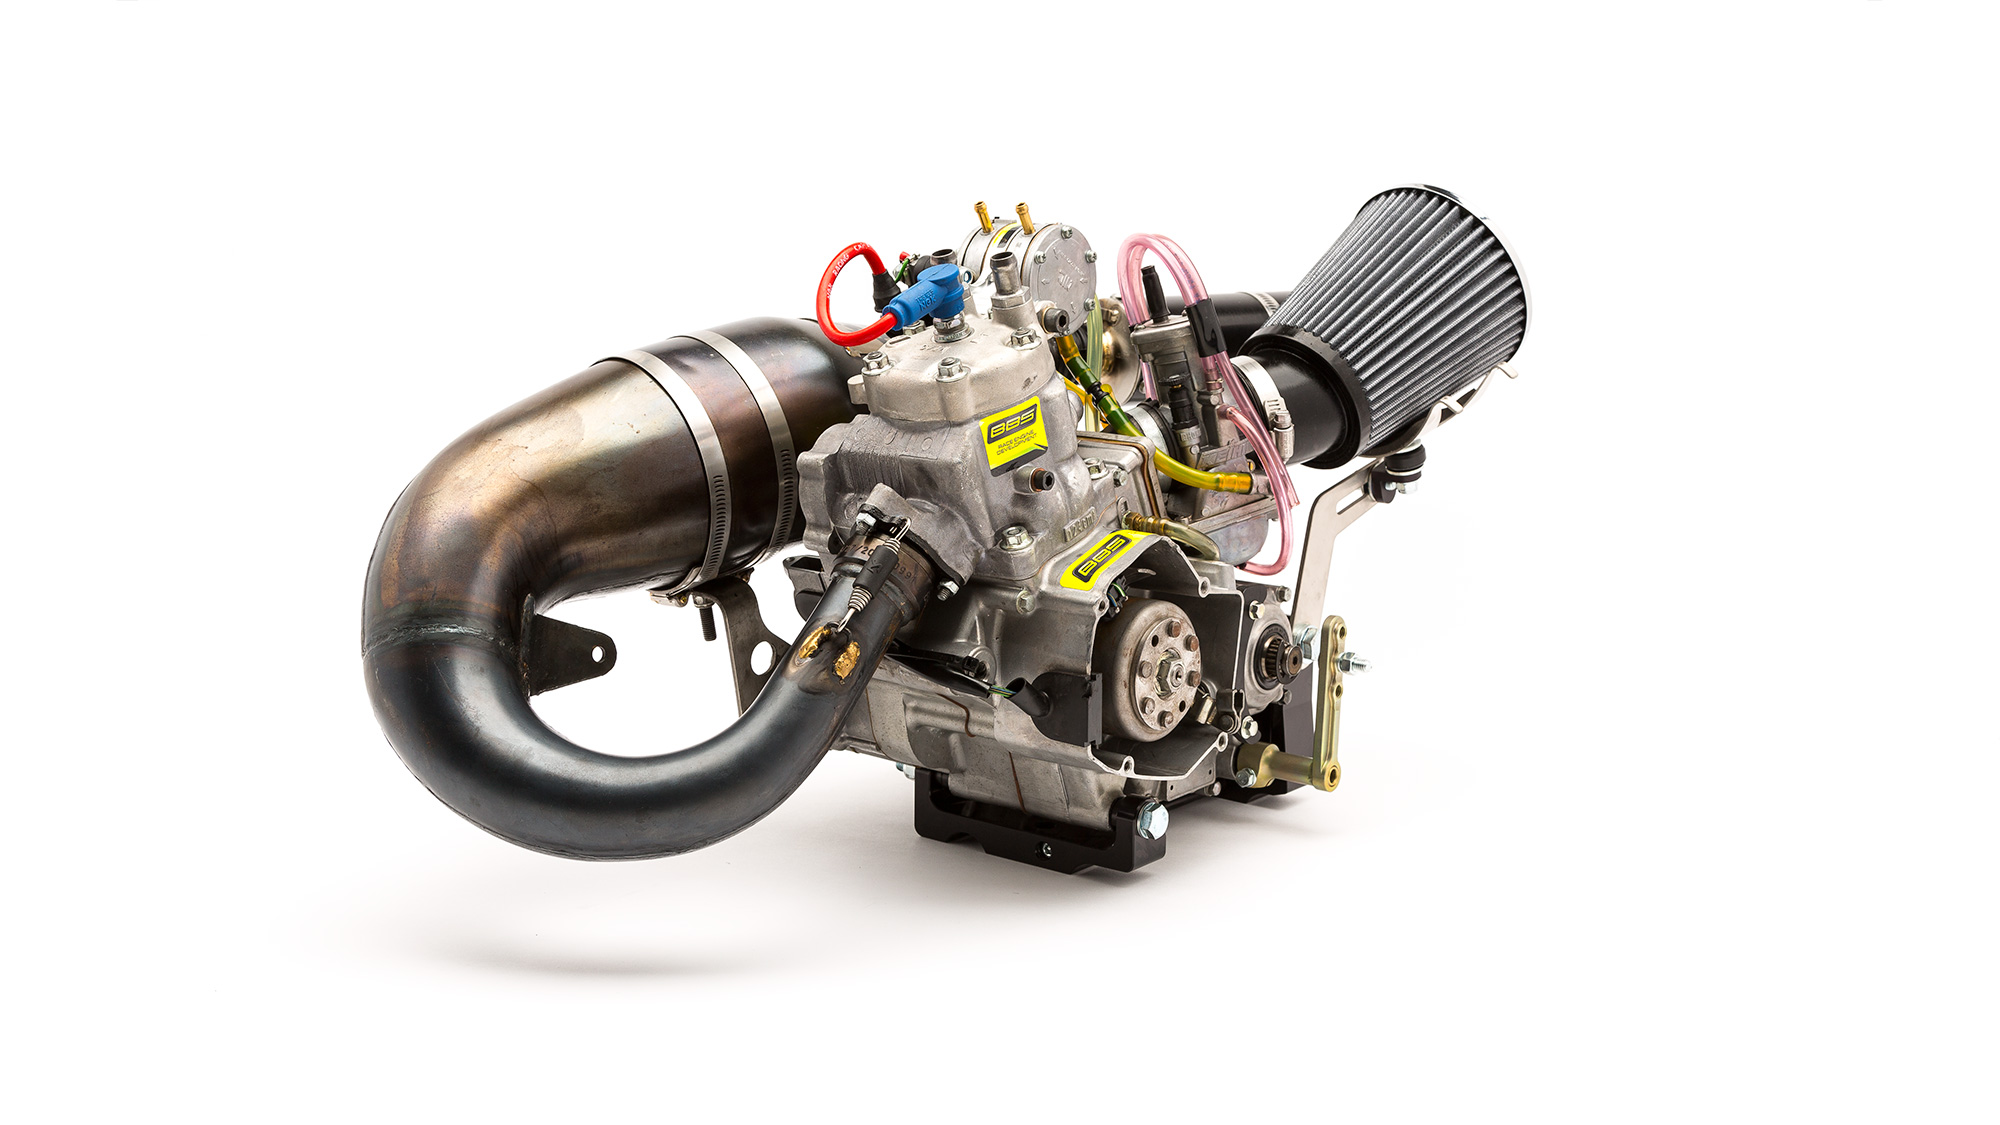 Bbs Race Engines Bbs Honda Cr125 Stock Moto